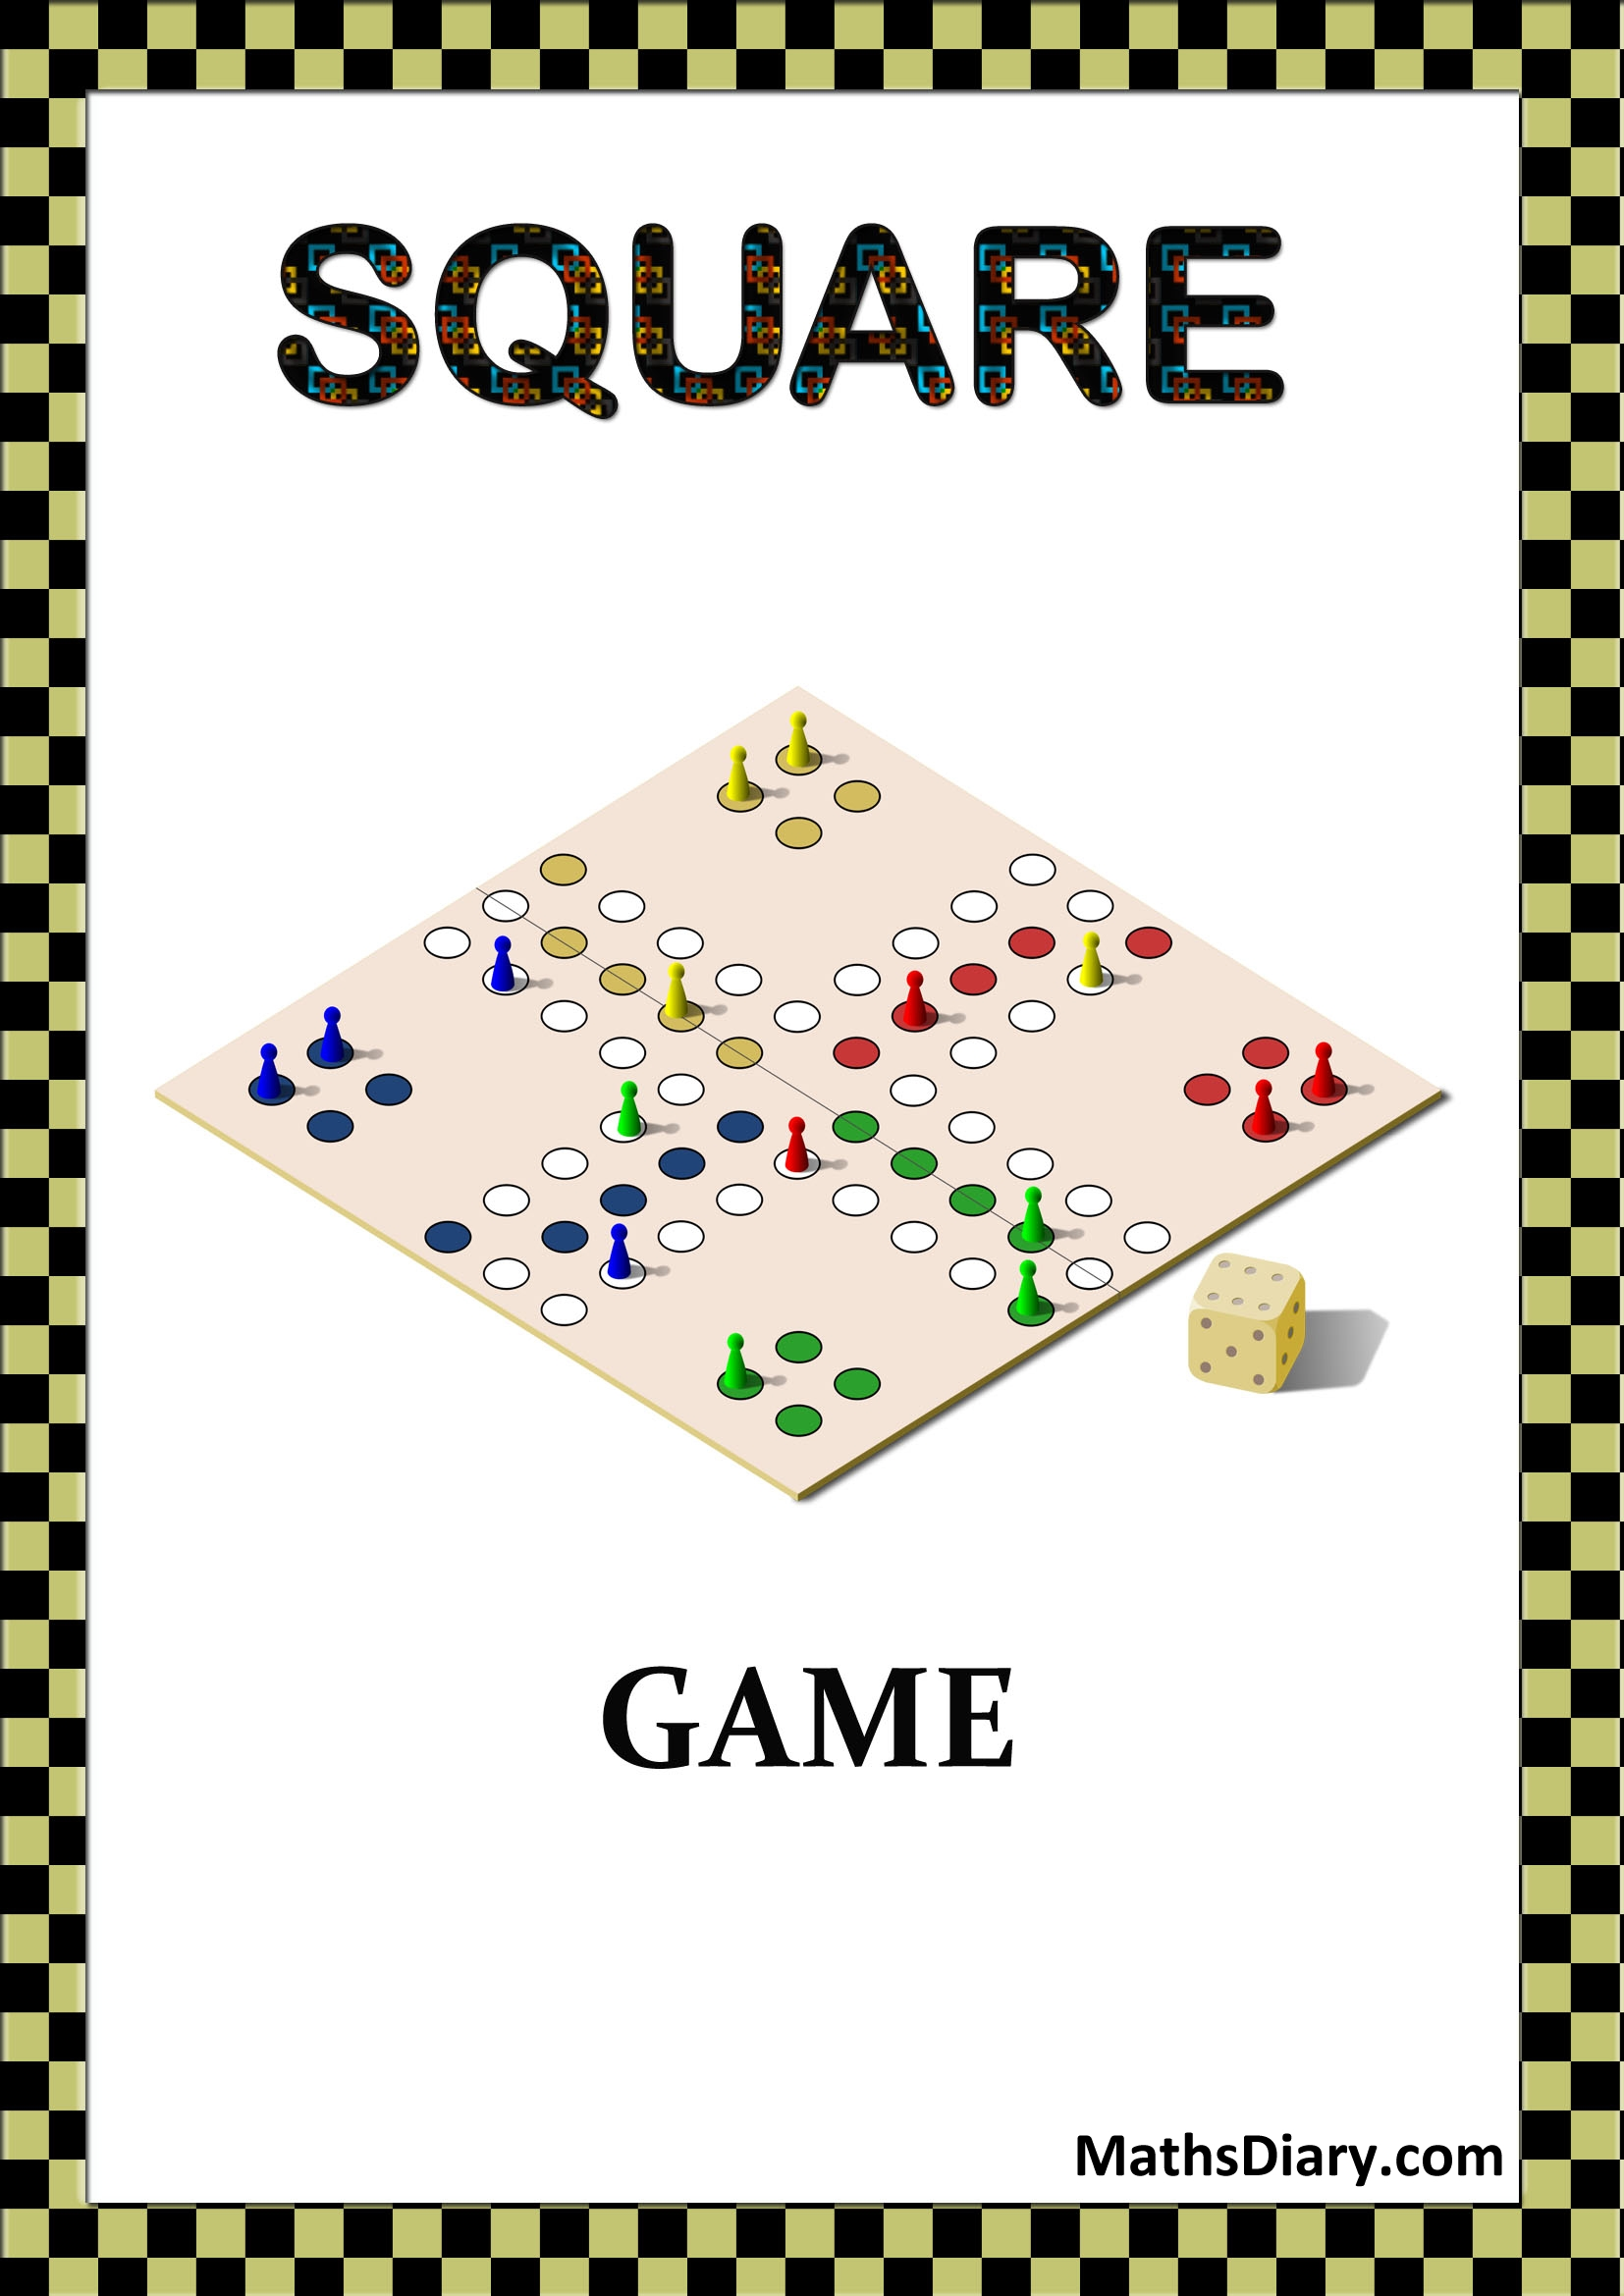 worksheet Identifying Shapes Worksheets identifying square shapes worksheets mathsdiary com game